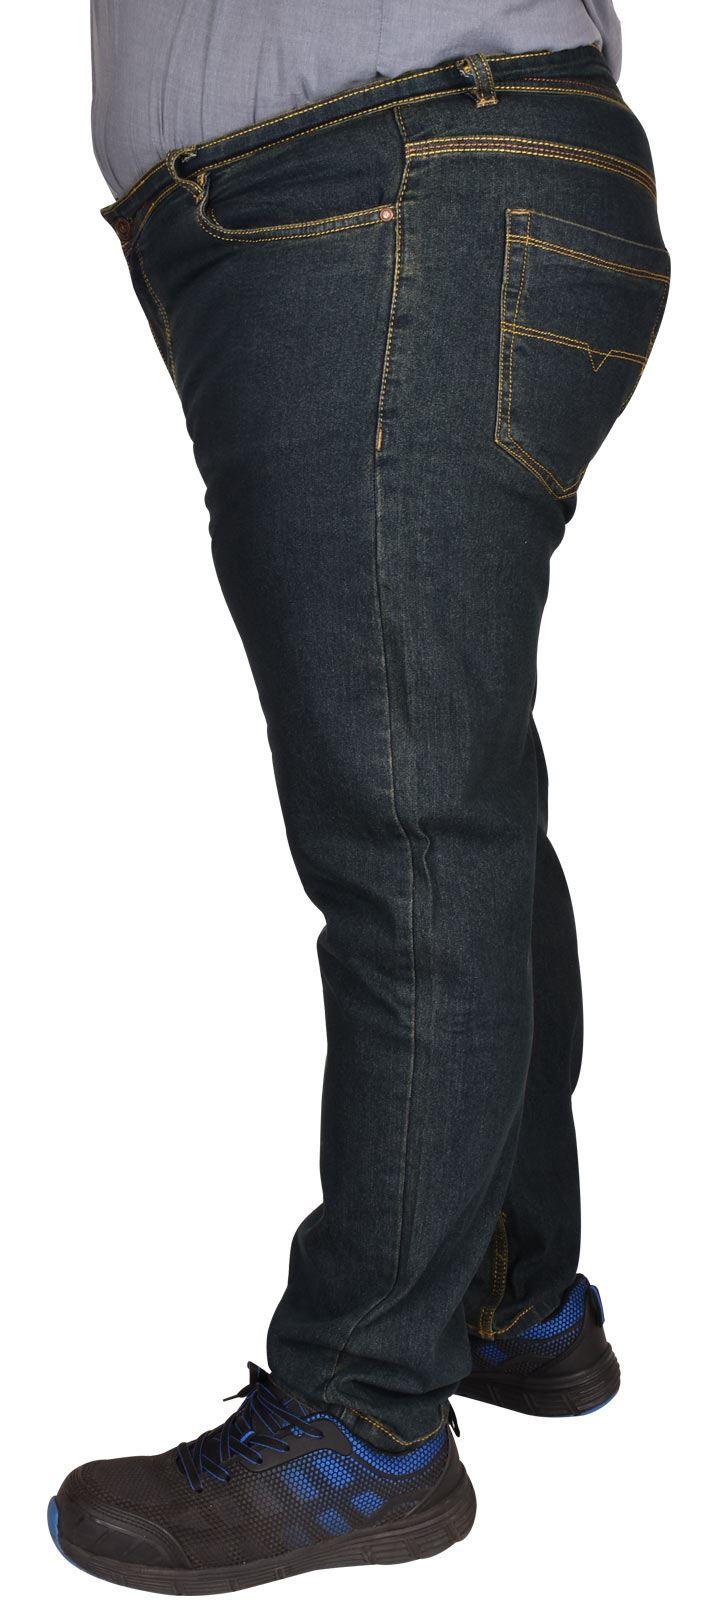 Men-Jeans-Straight-Leg-Stretch-Denim-Trouser-Pants-All-Waist-Big-Tall-King-Sizes thumbnail 3